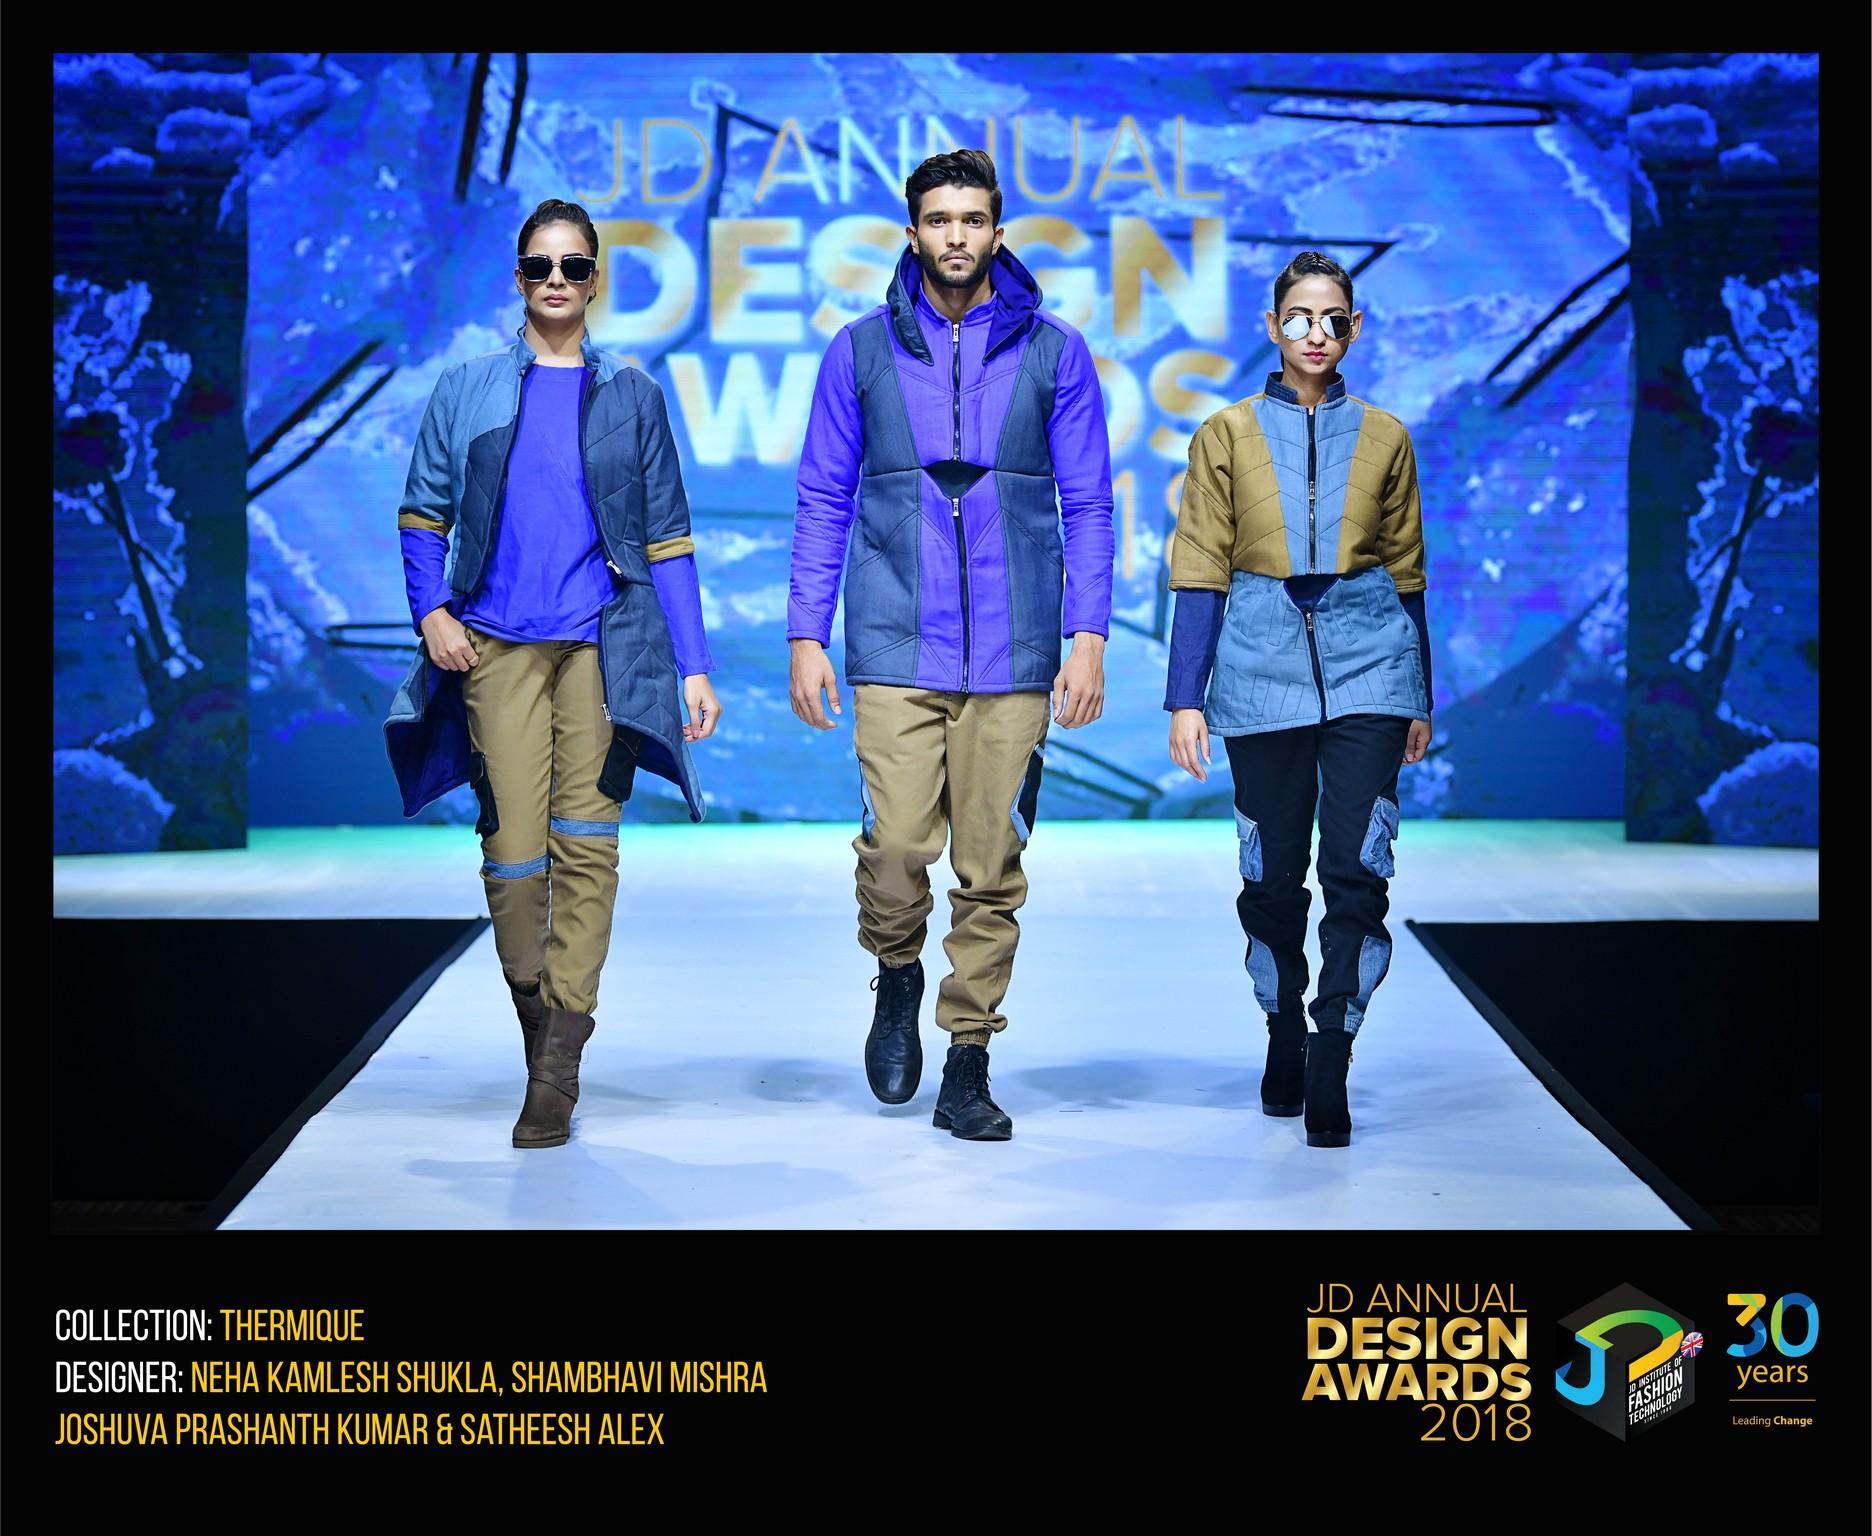 Thermique – Change – JD Annual Design Awards 2018 | Designer: Shambhavi, Neha and satish | Photography : Jerin Nath (@jerin_nath) thermique Thermique – Change – JD Annual Design Awards 2018 THERMIQUE 9